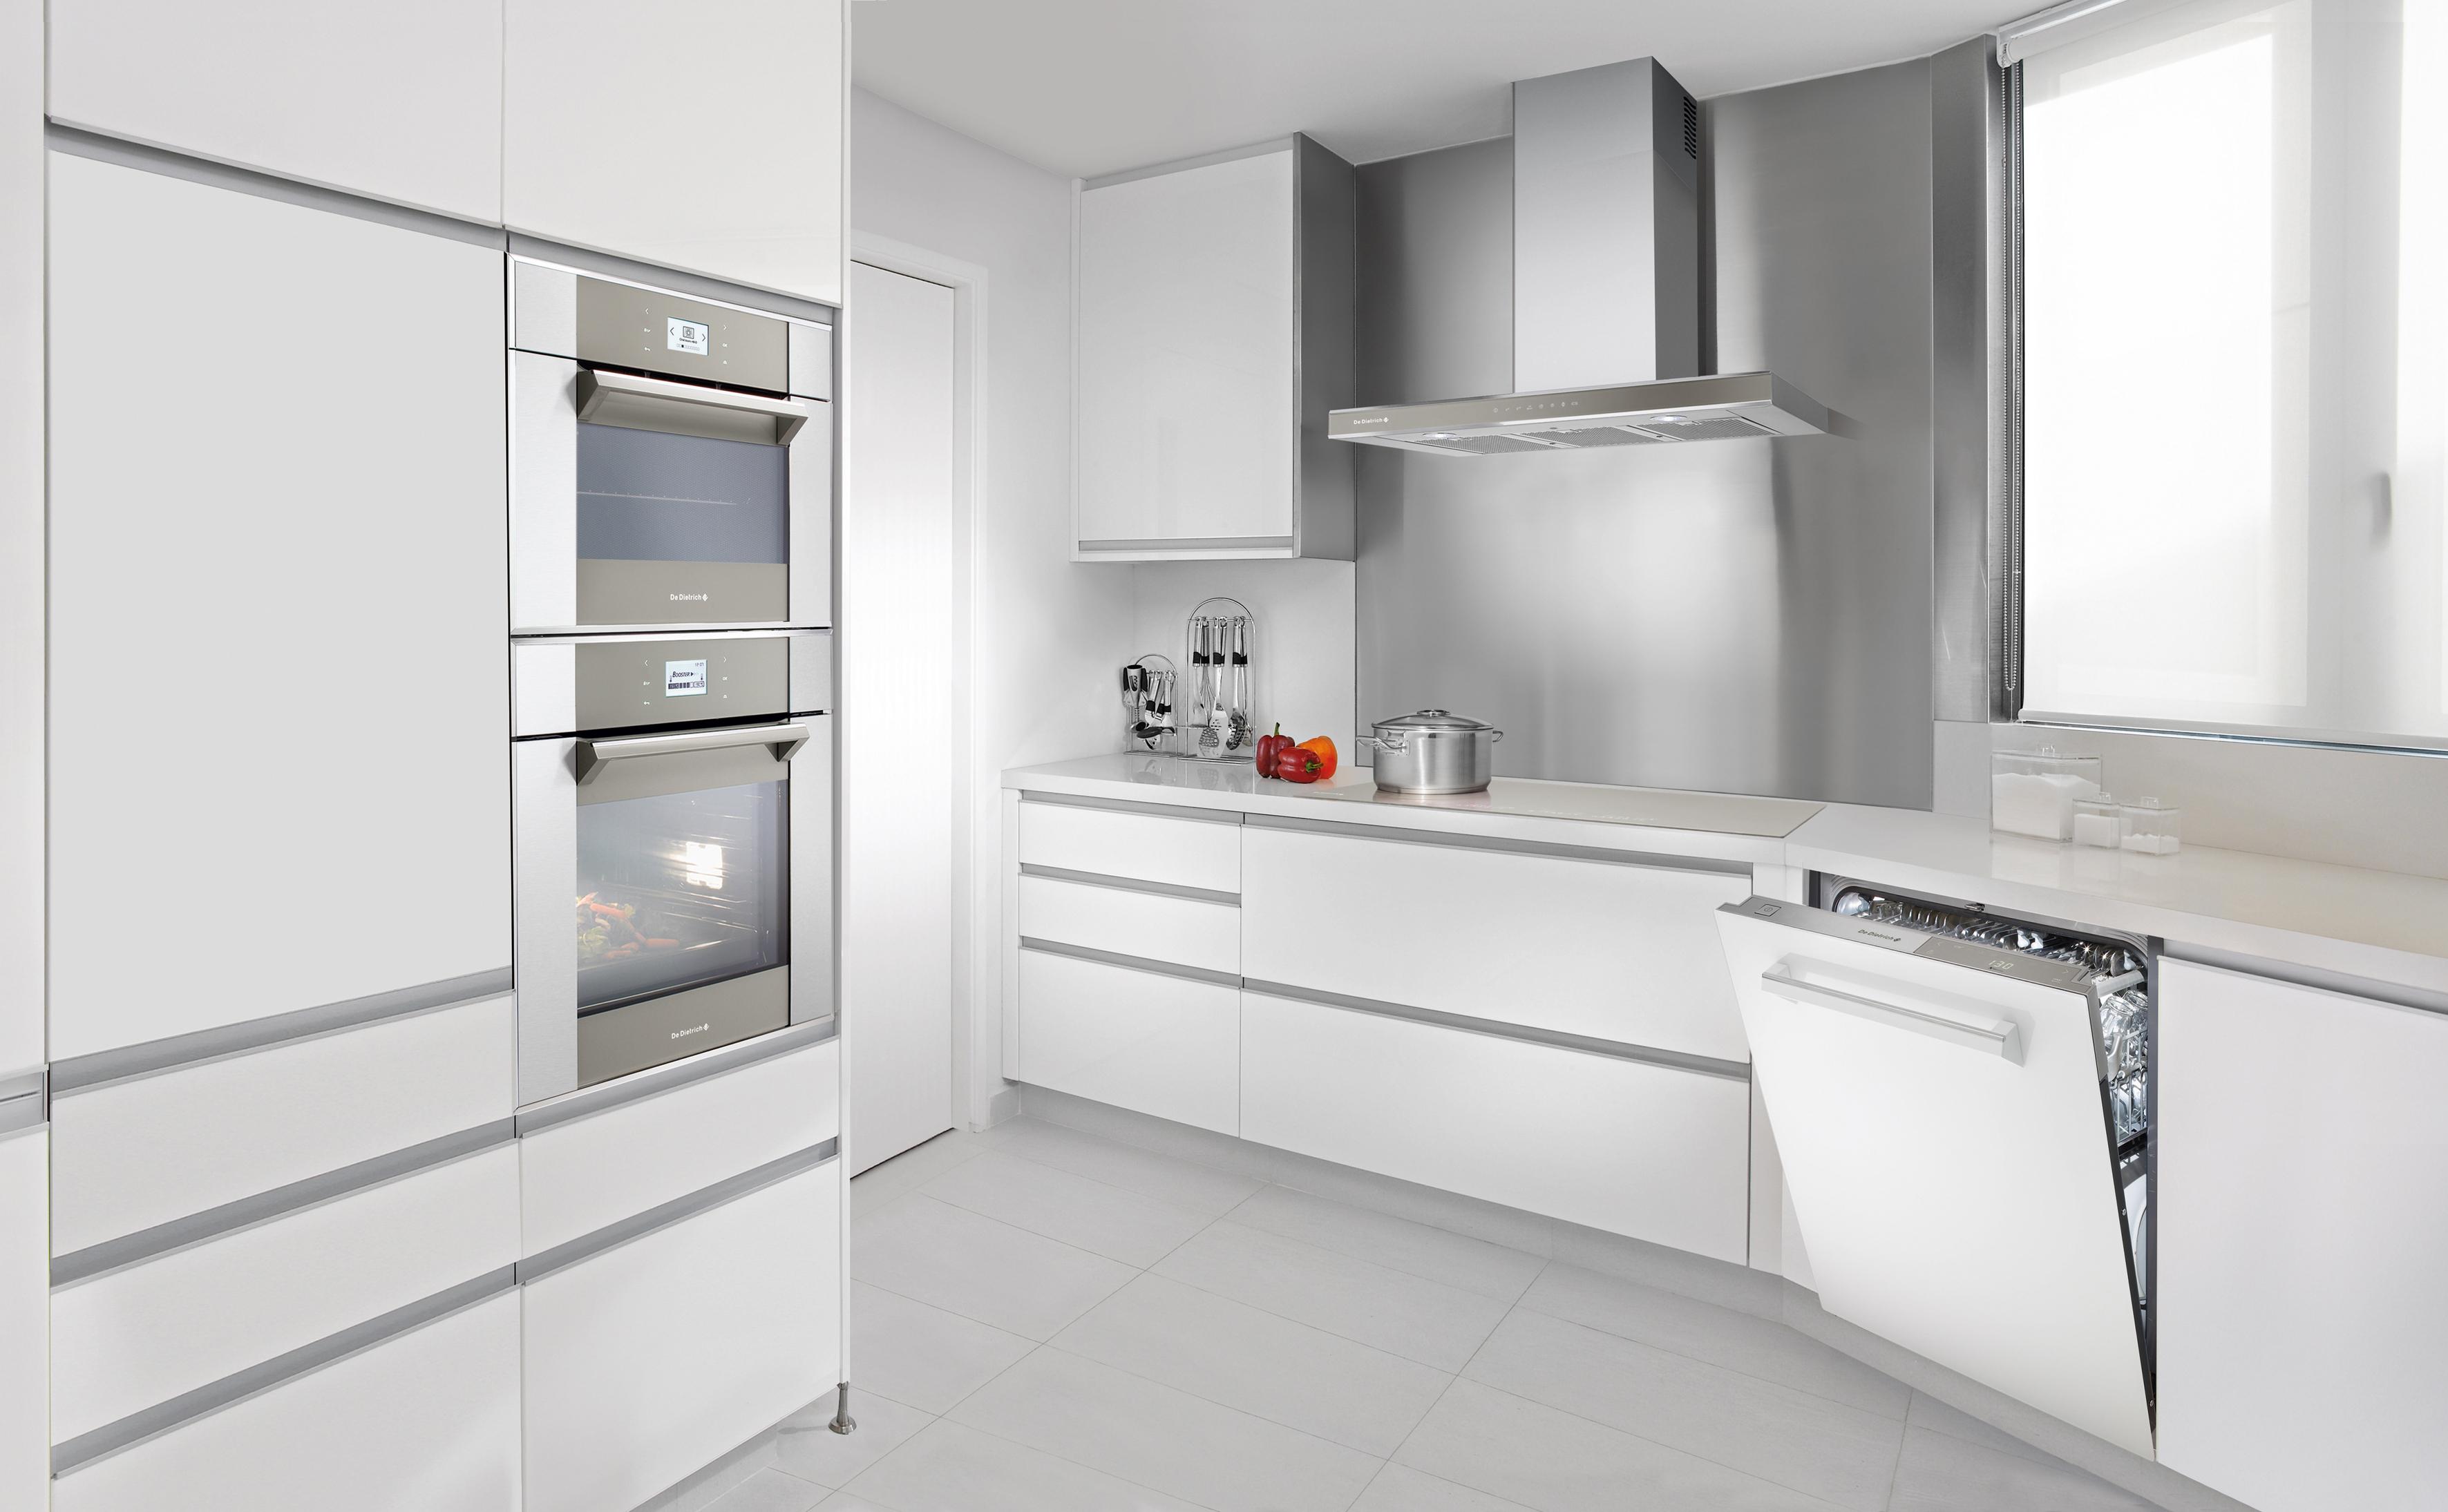 kitchen appliances - home appliances - water filter - air purifier